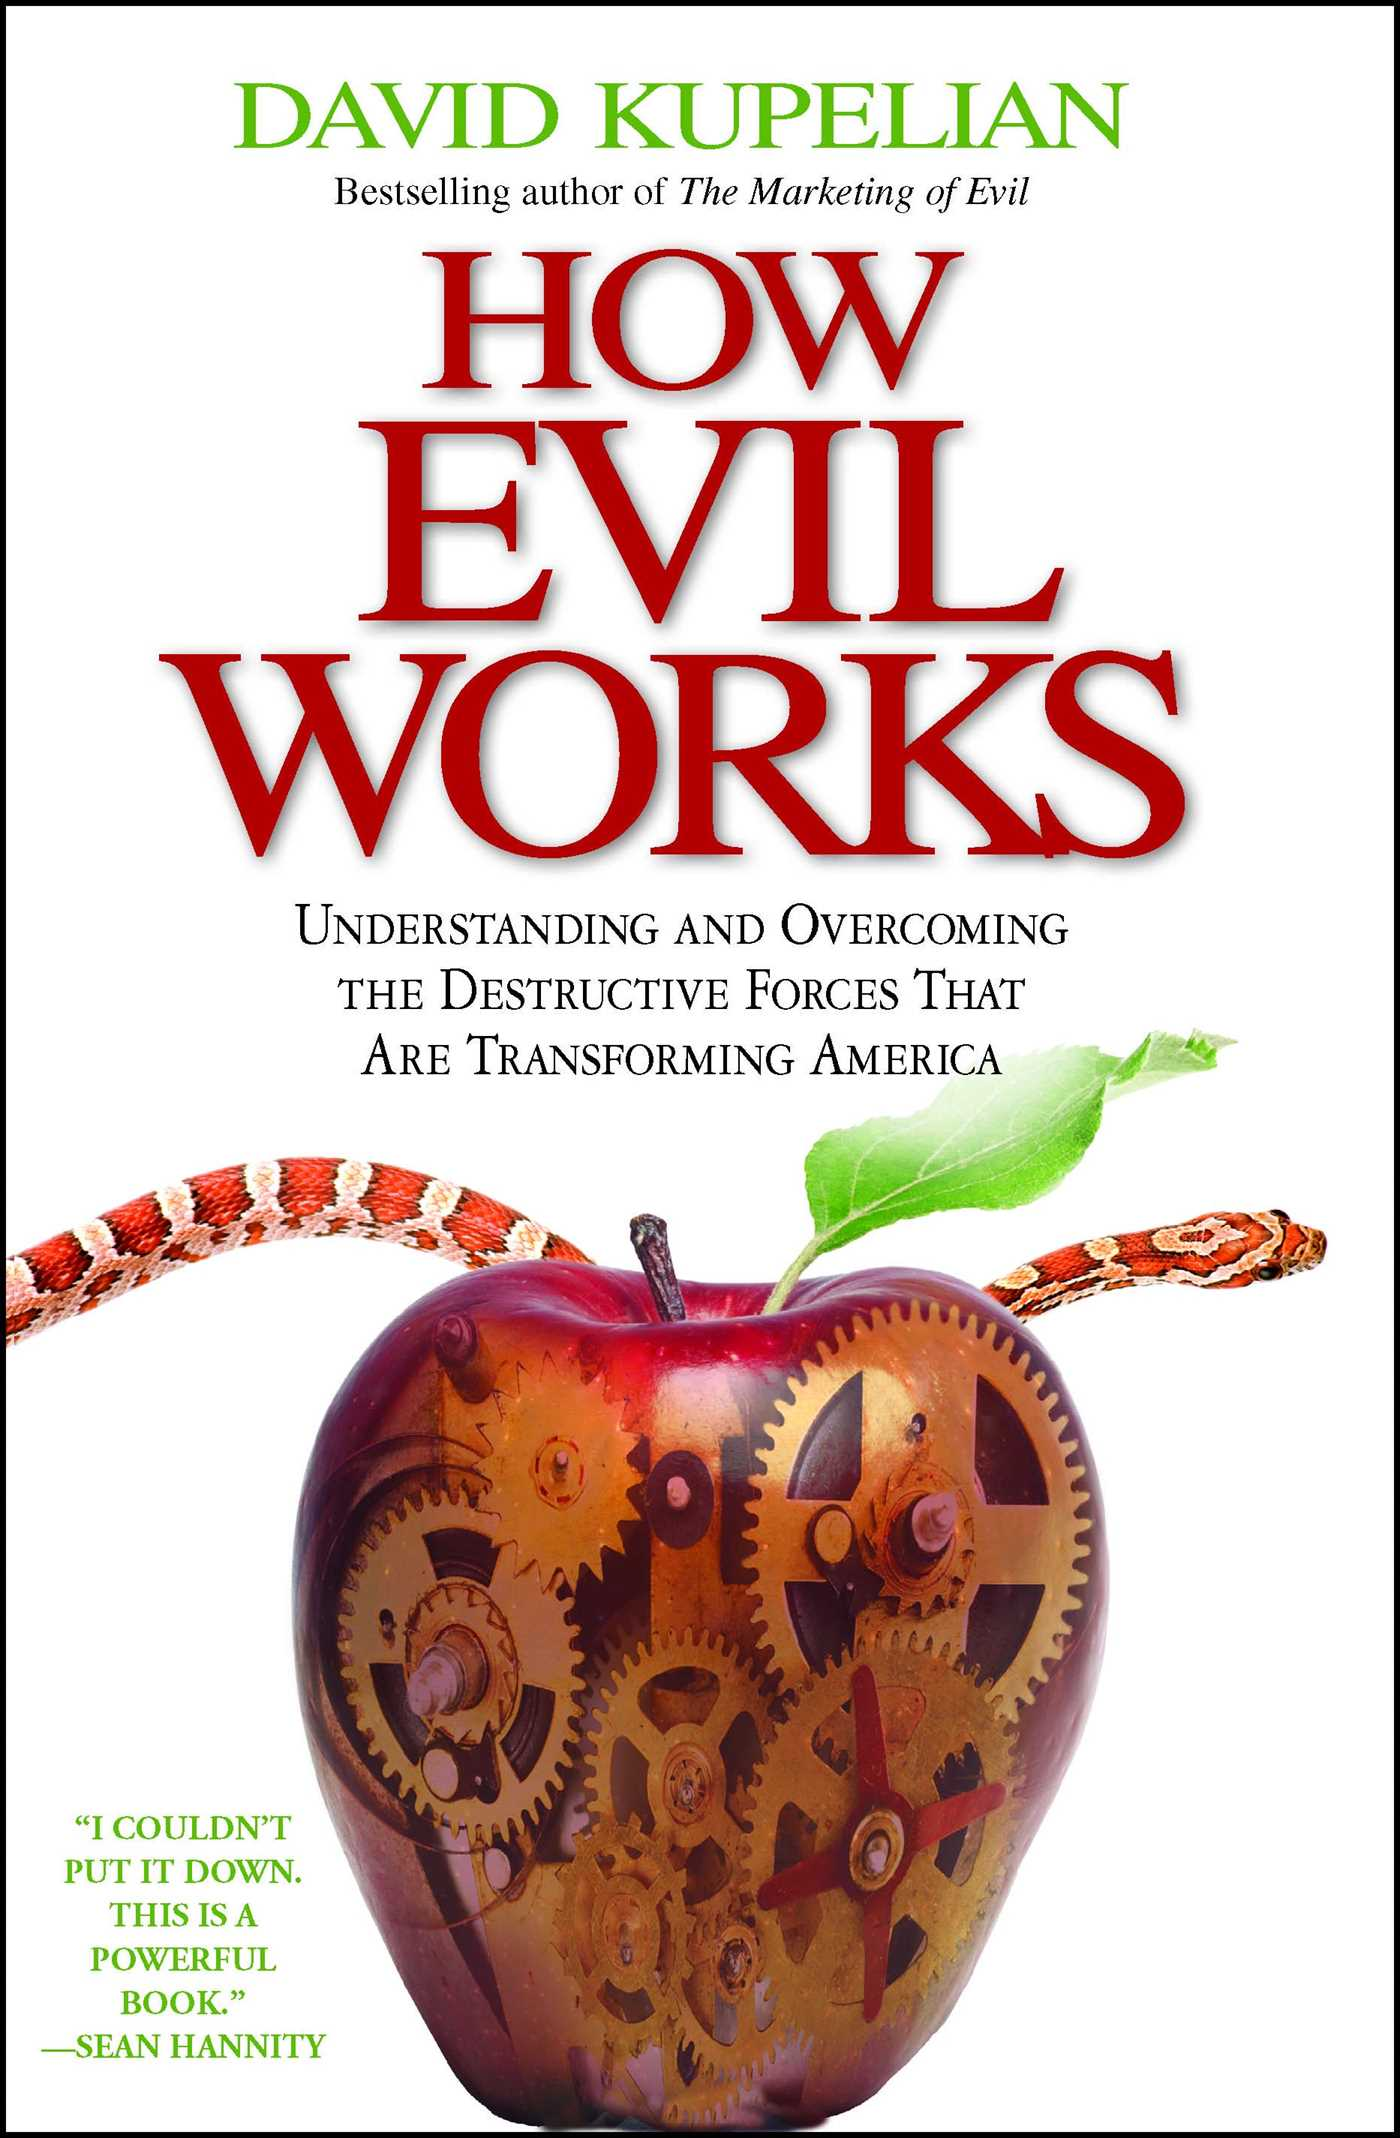 How evil works 9781439168202 hr